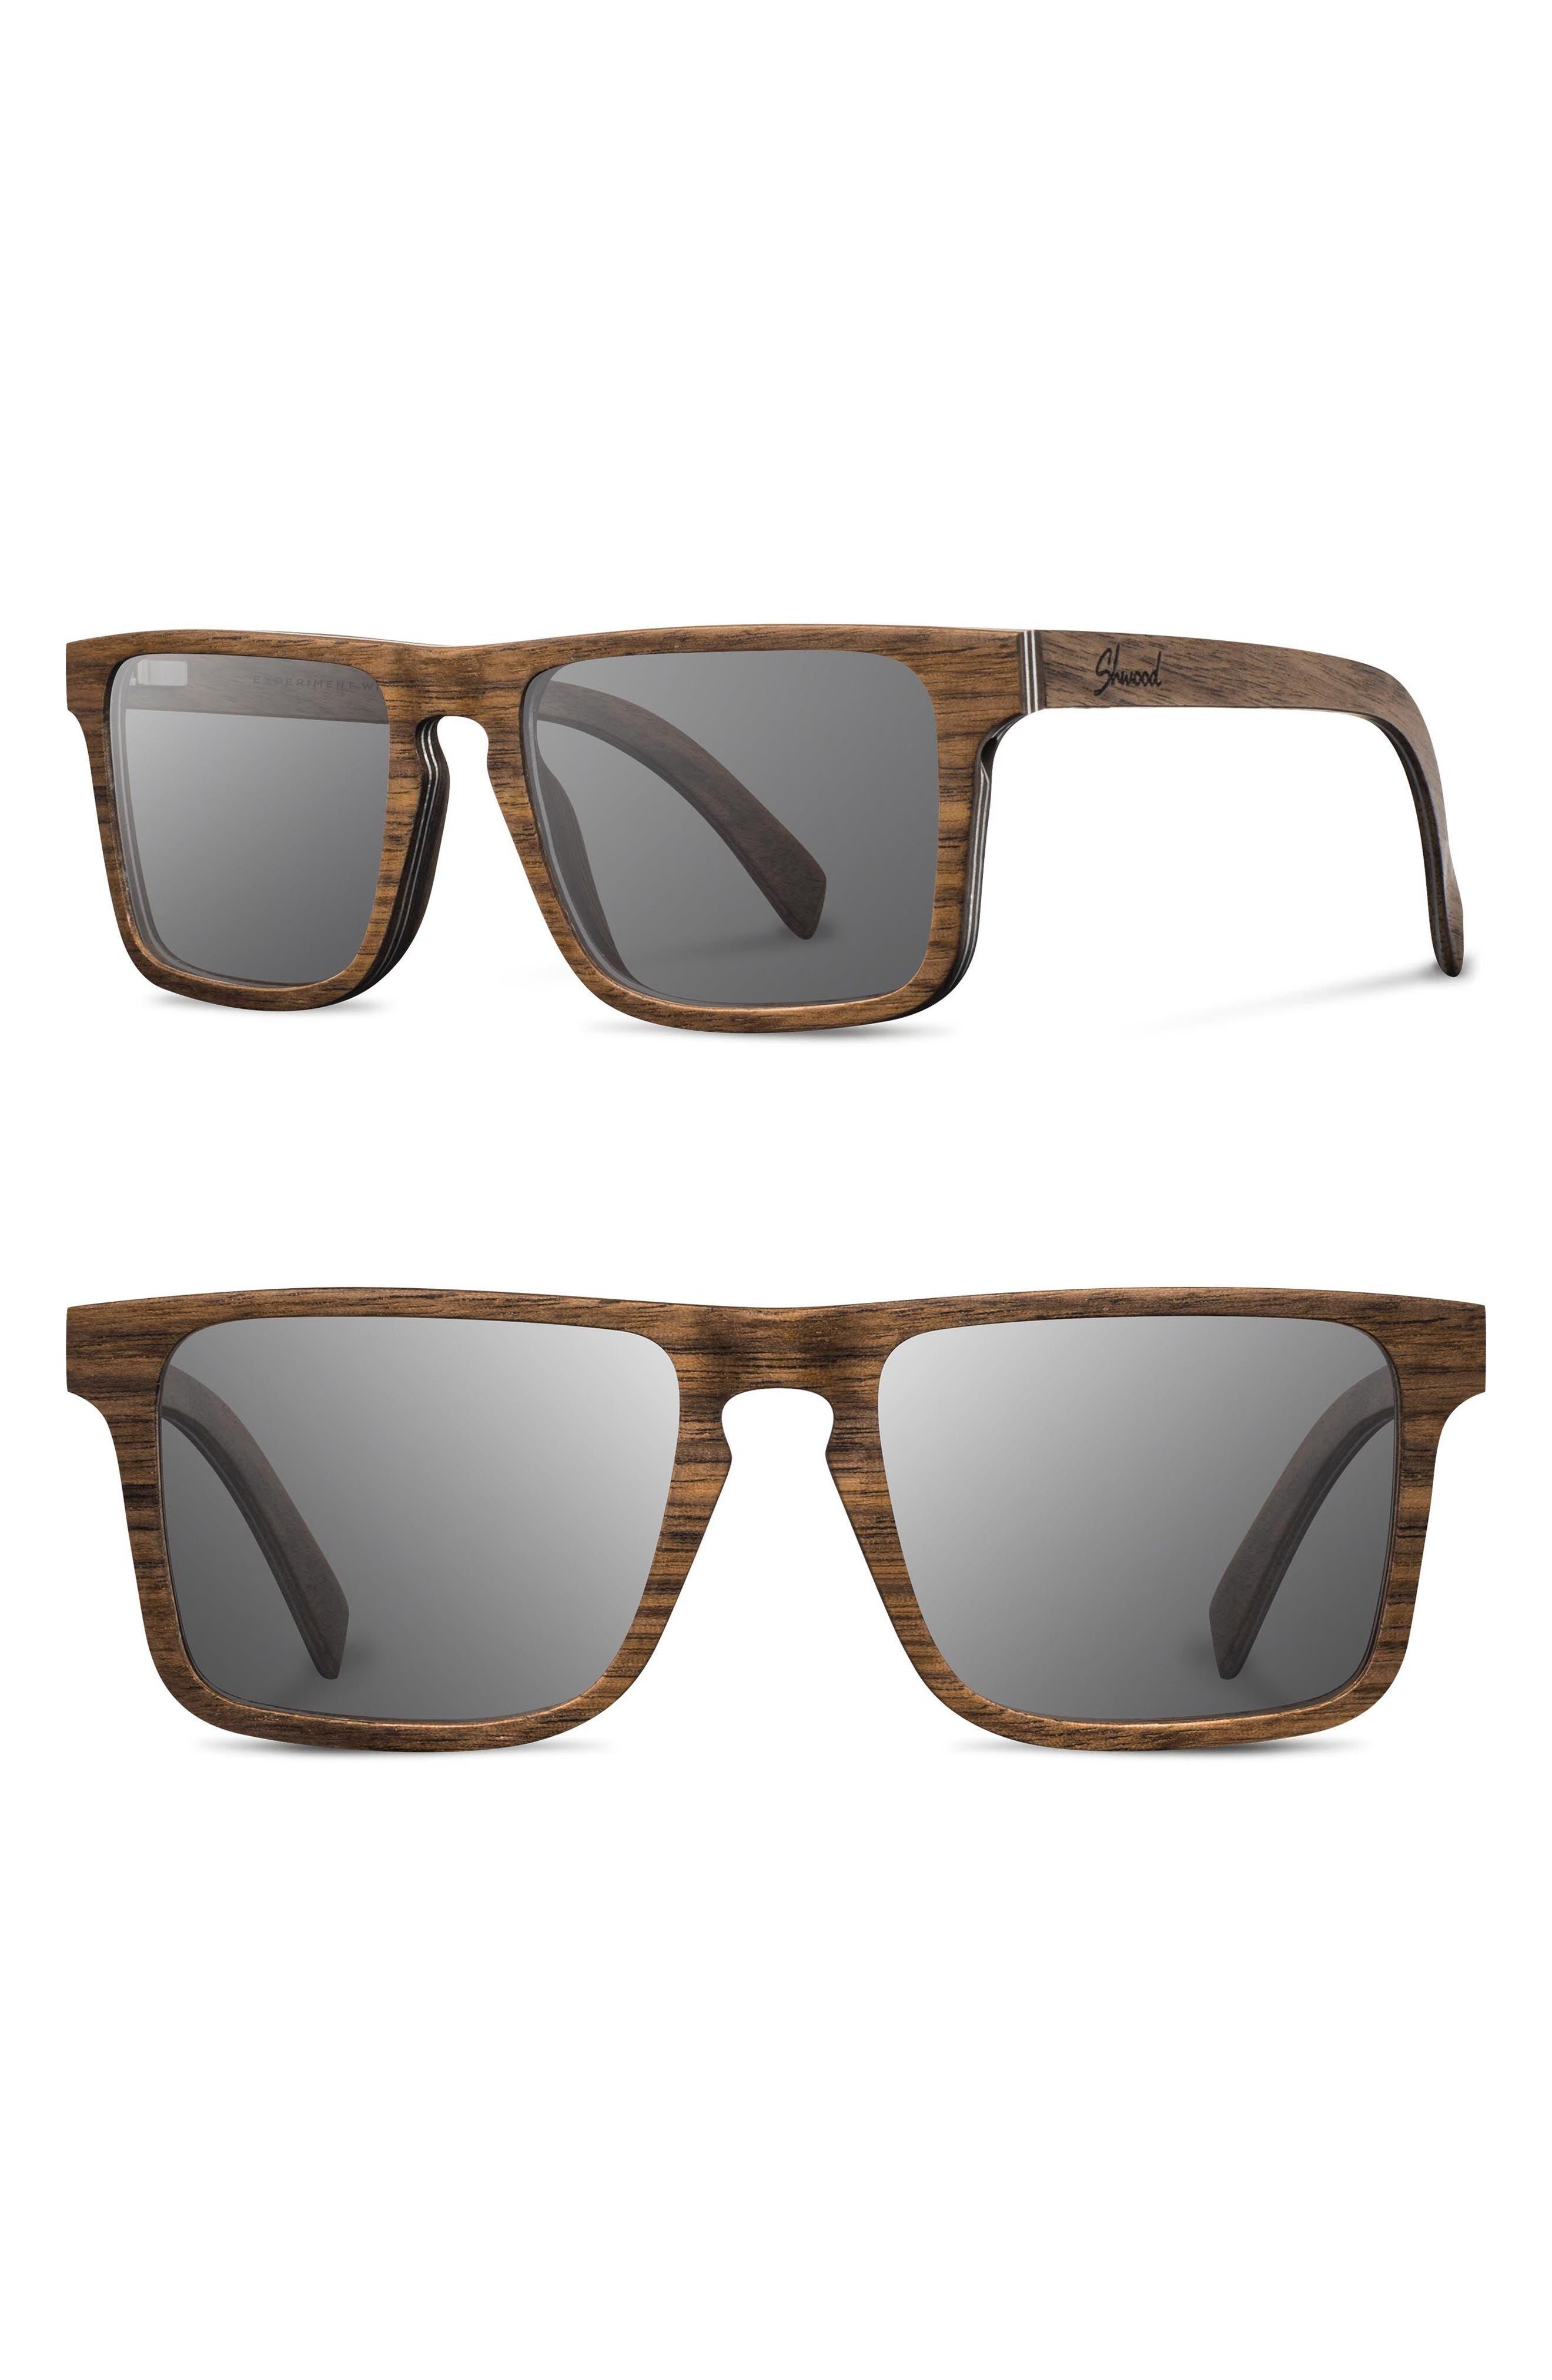 Govy 2 52mm Polarized Wood Sunglasses, Main, color, 210